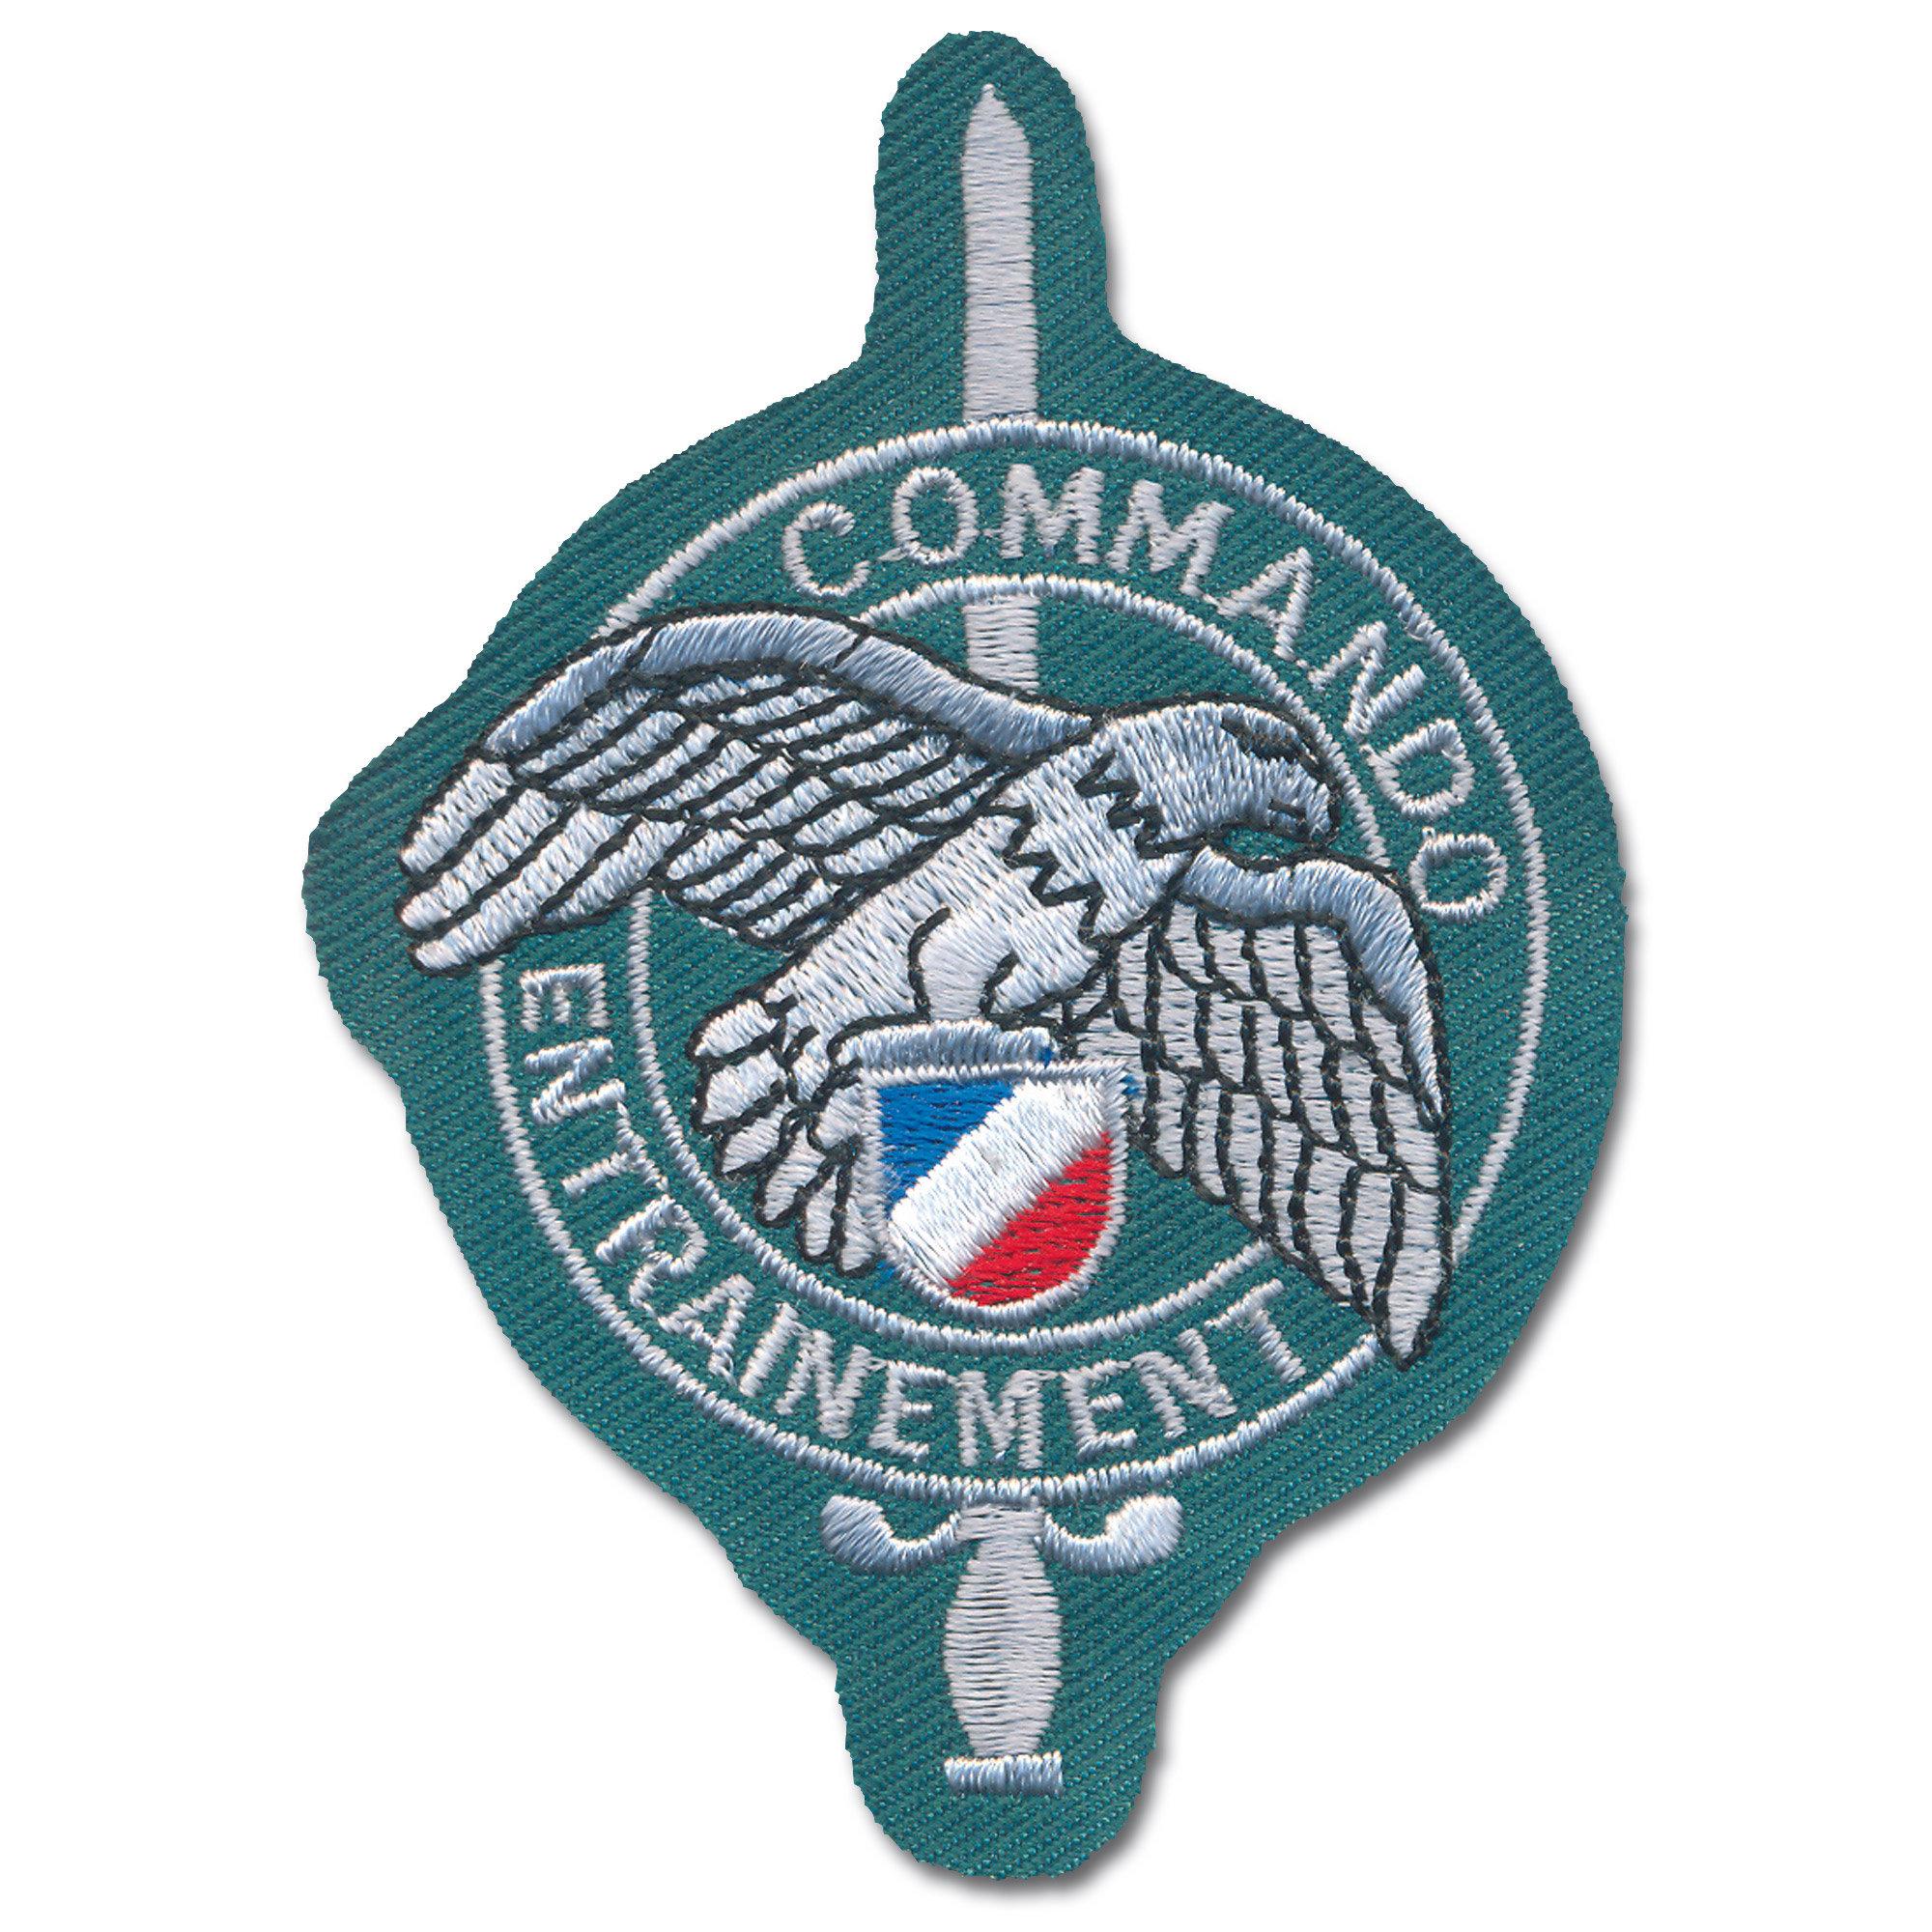 French Insignia Commando Entrainement green